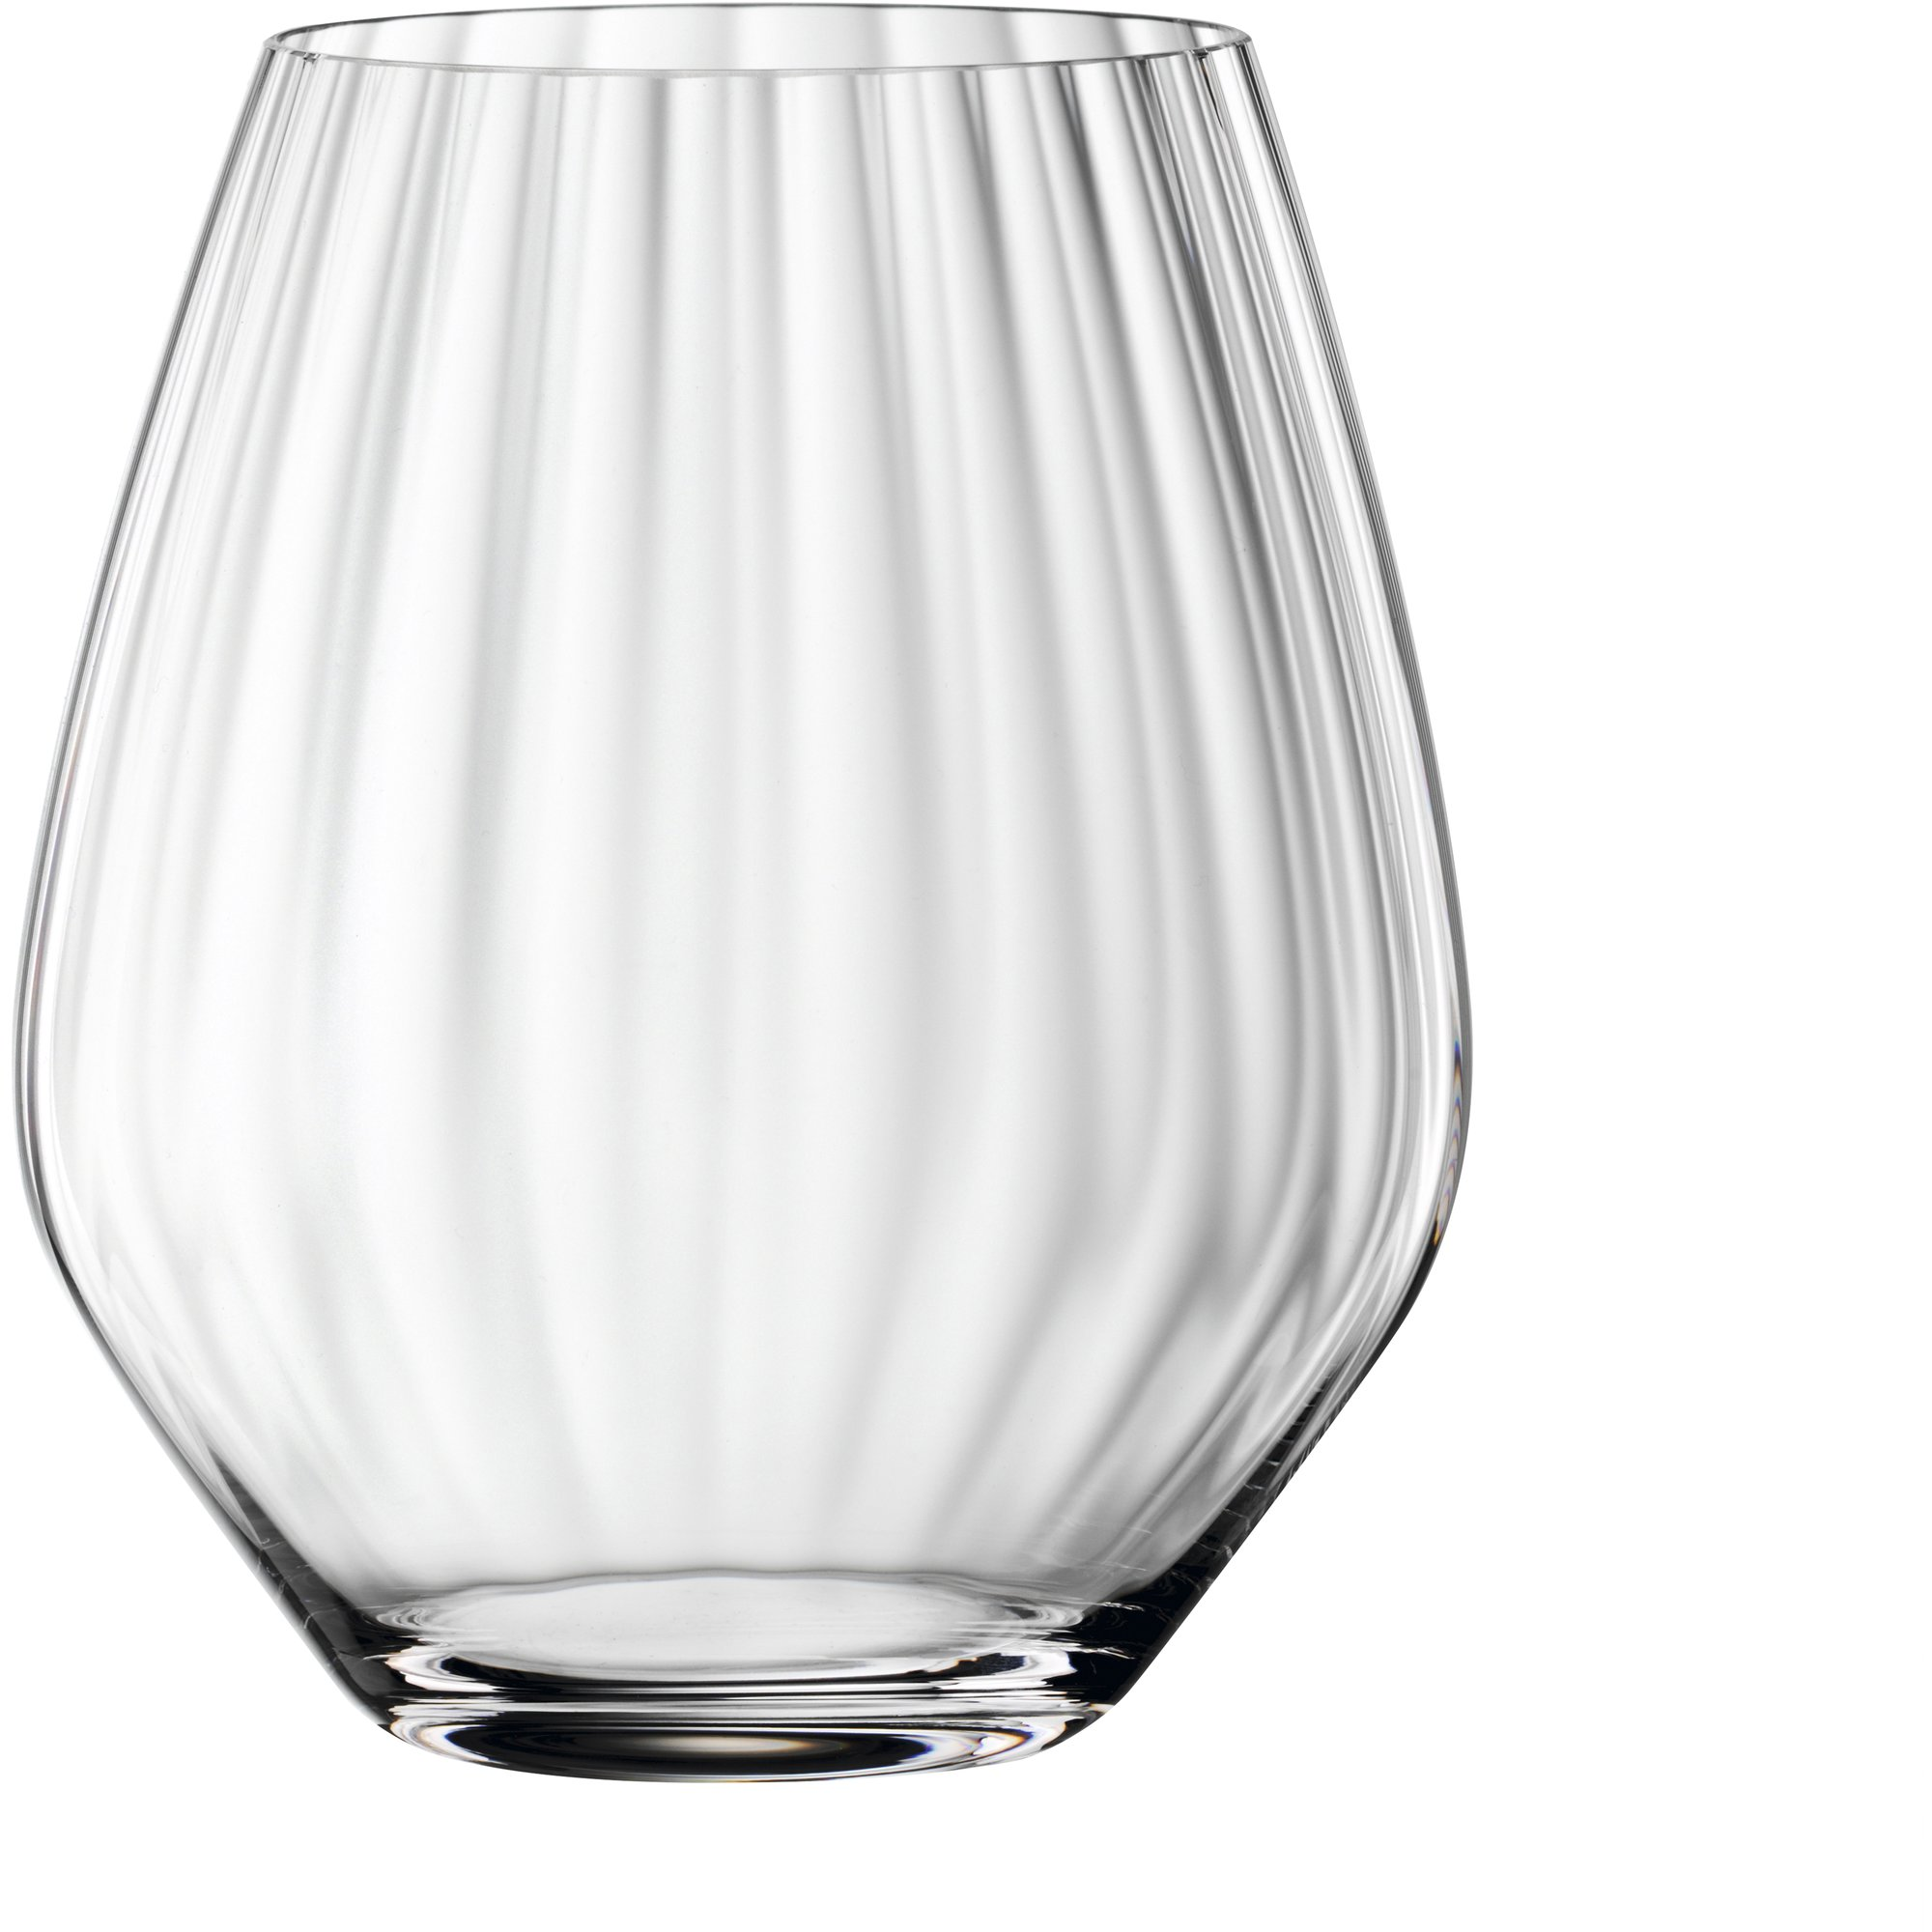 Spiegelau Gin & Tonic Glas 63 cl